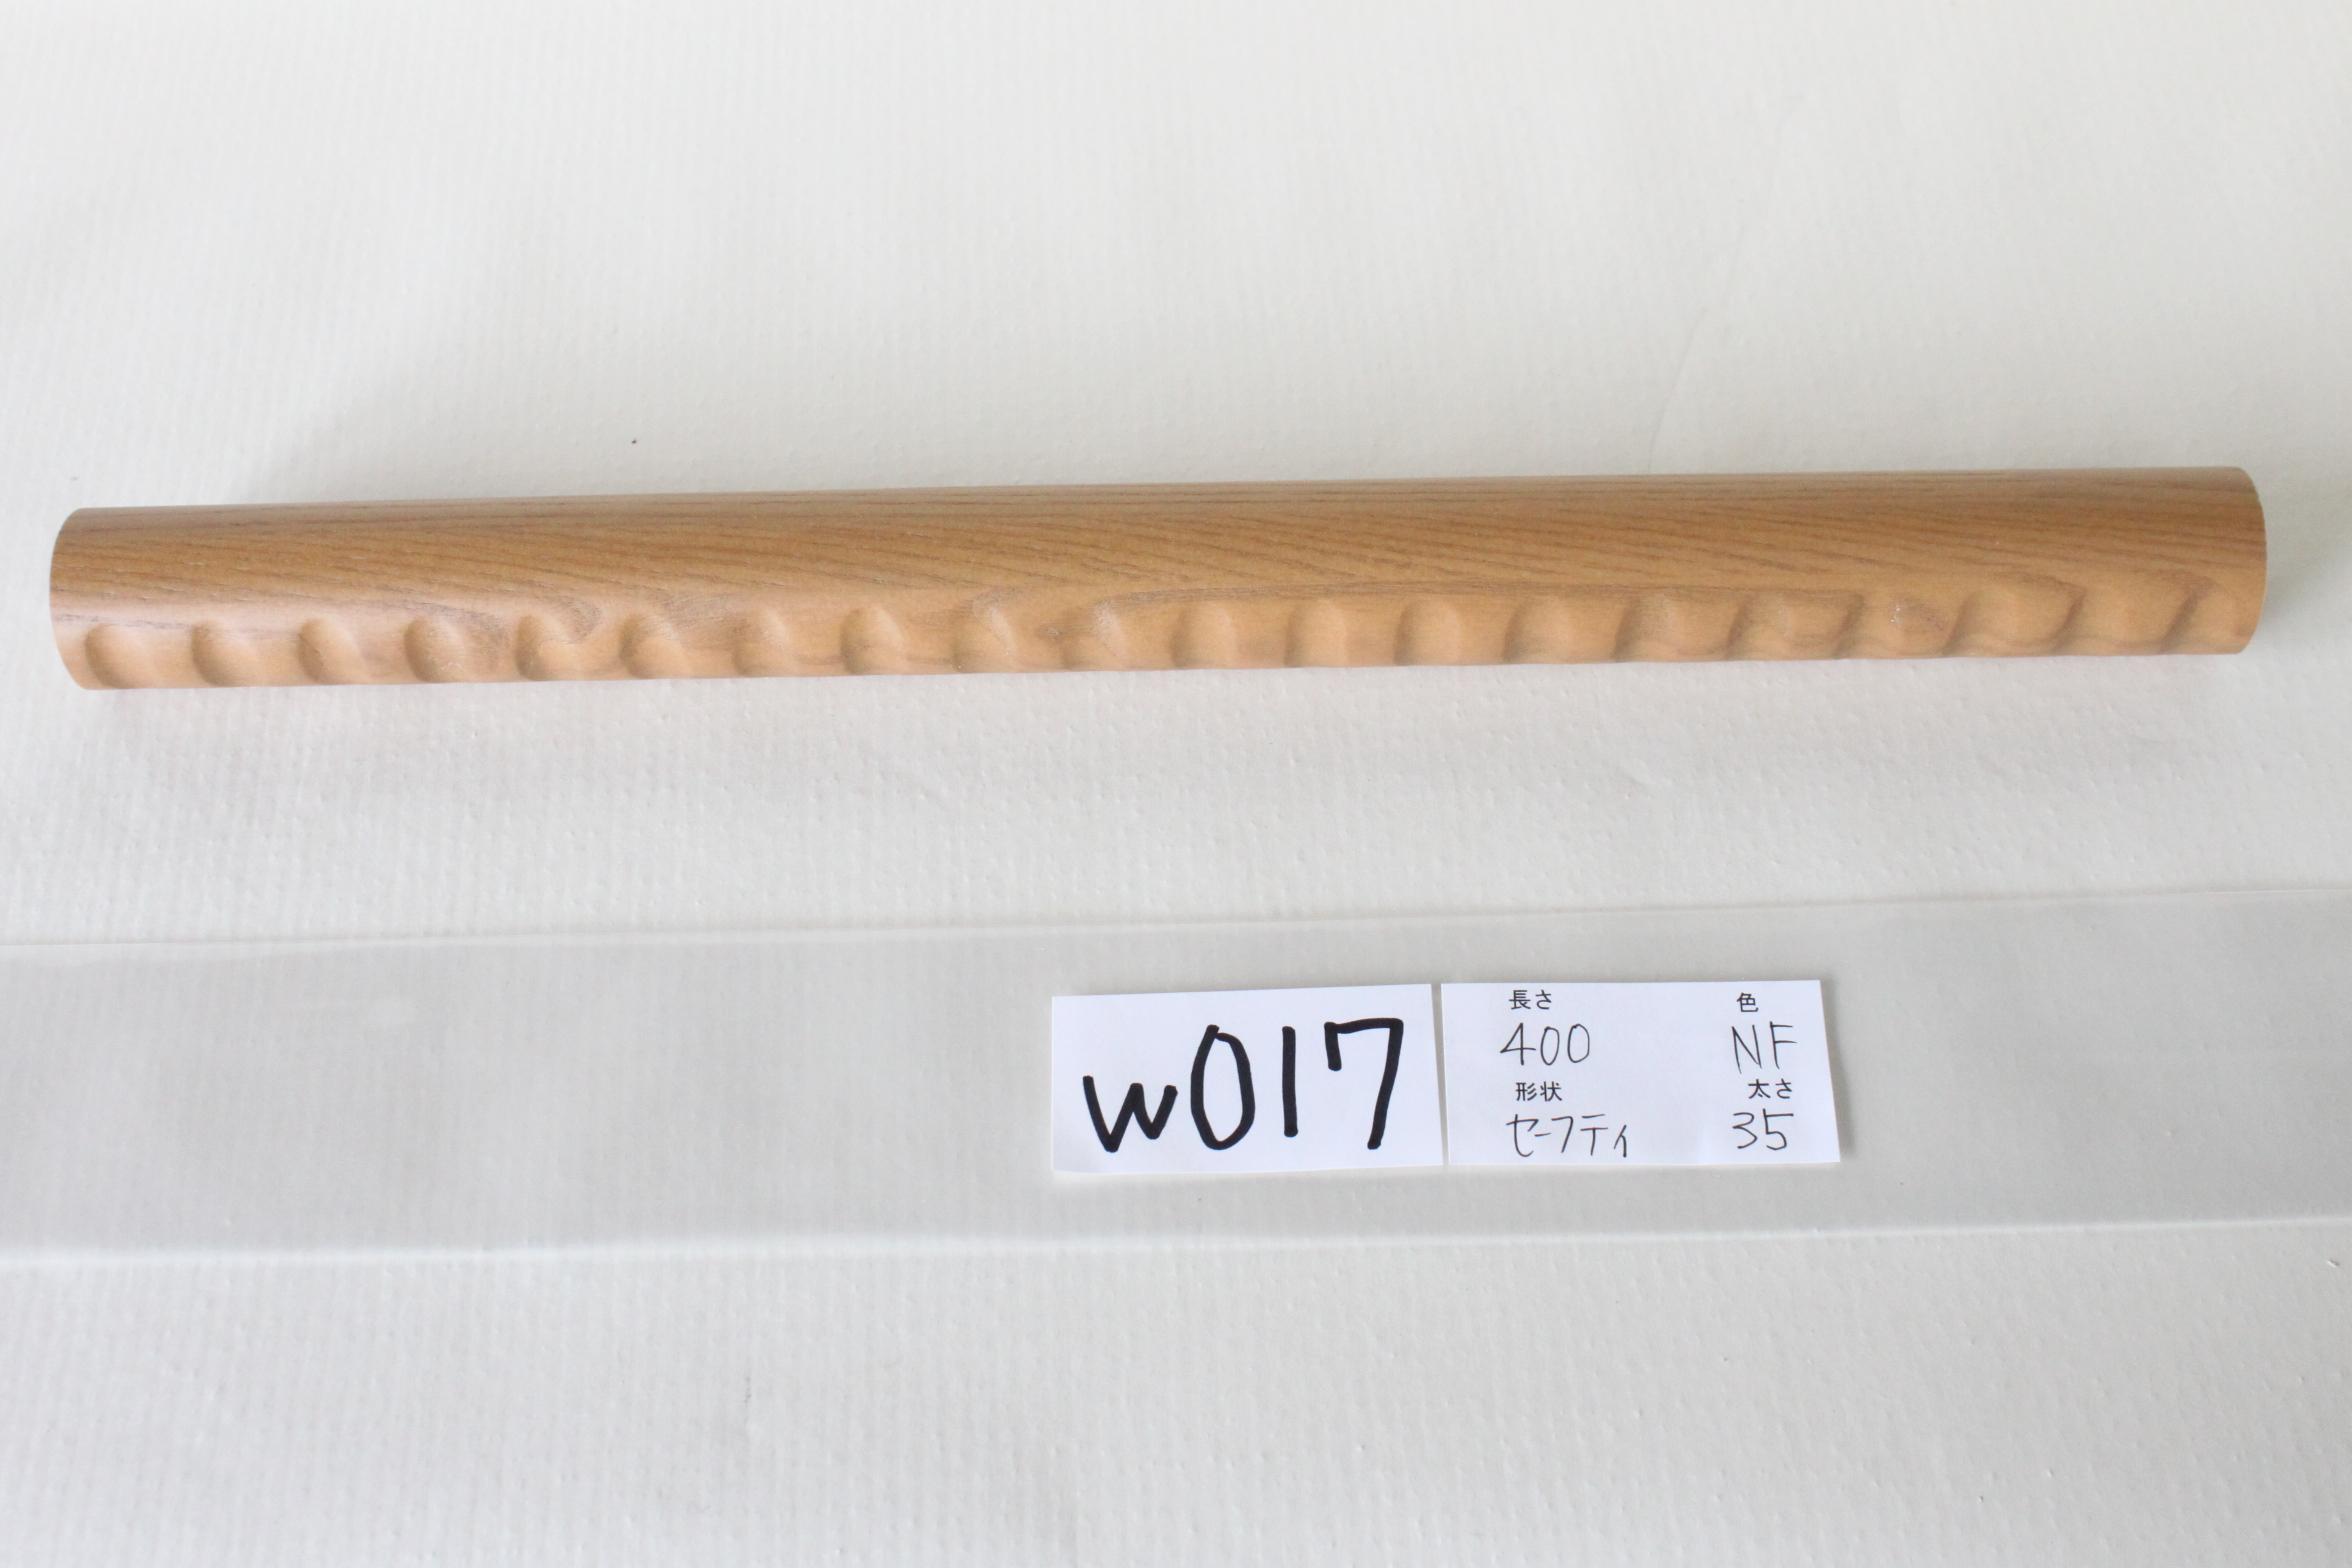 TOTO手すり(EWT22AG35#NF)のカット品